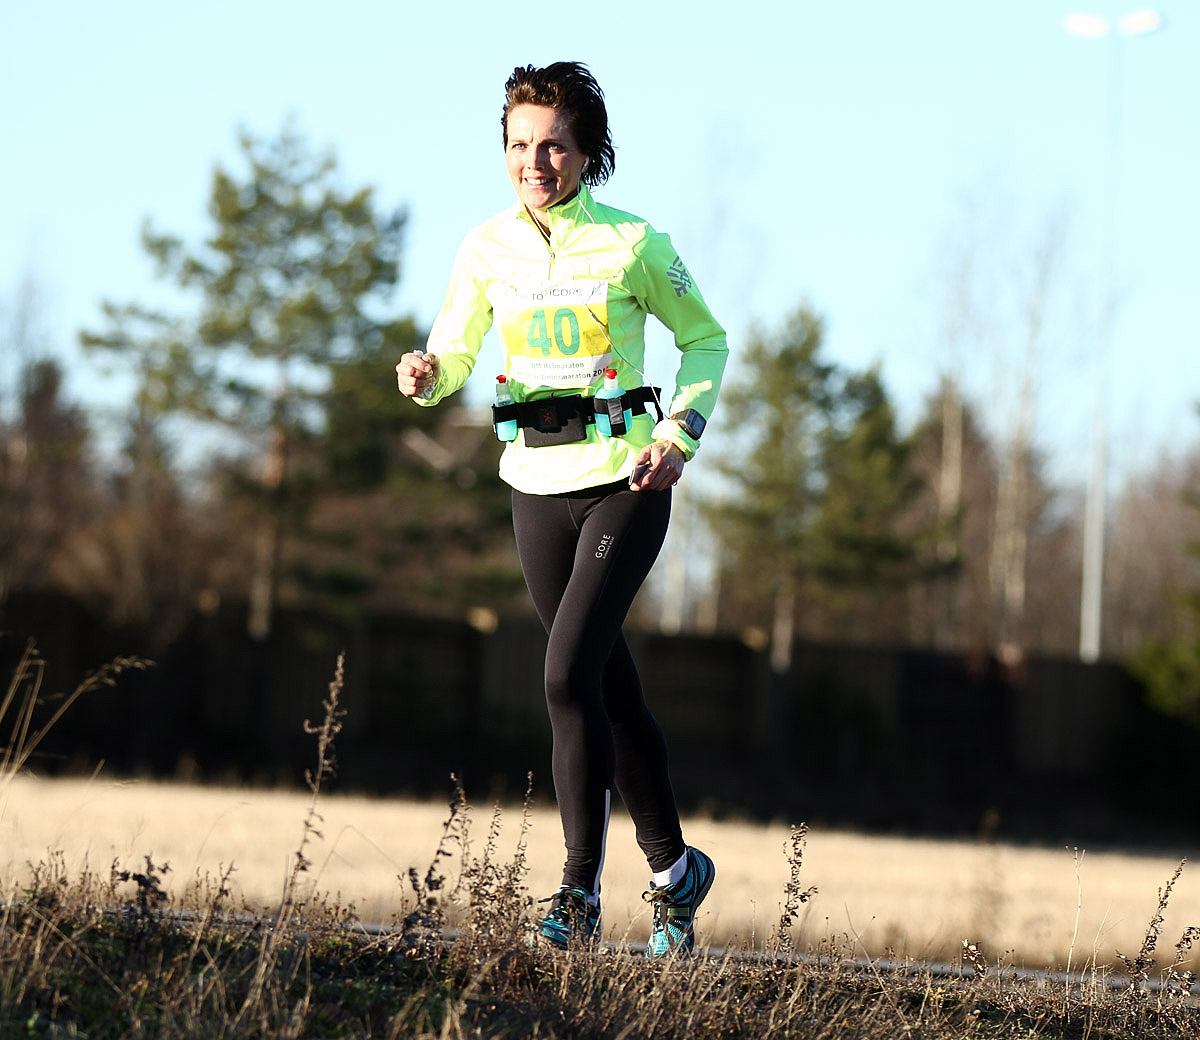 Vintermaraton2013_Elin-Drangsholt_16km.jpg